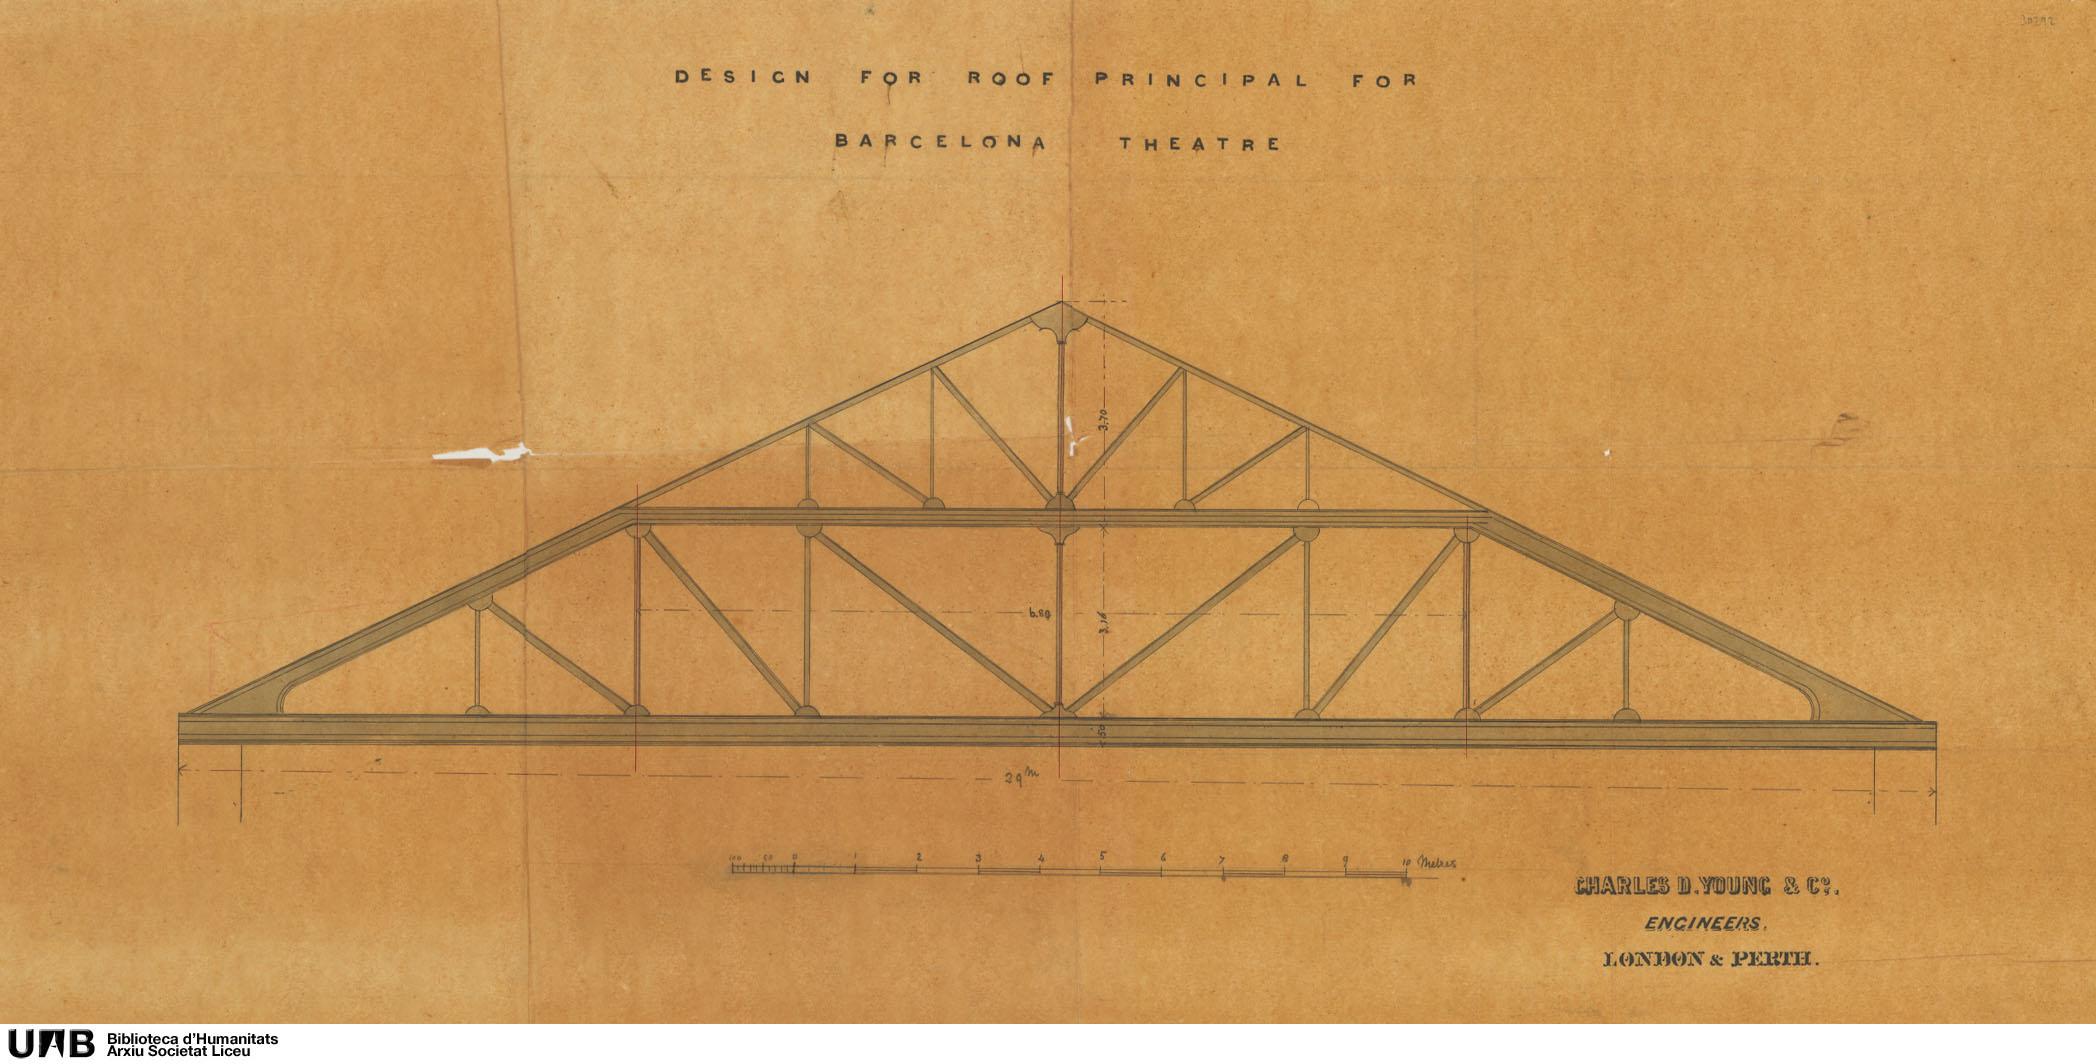 Design for roof principal for Barcelona Theatre : Alzado de cercha de cubierta